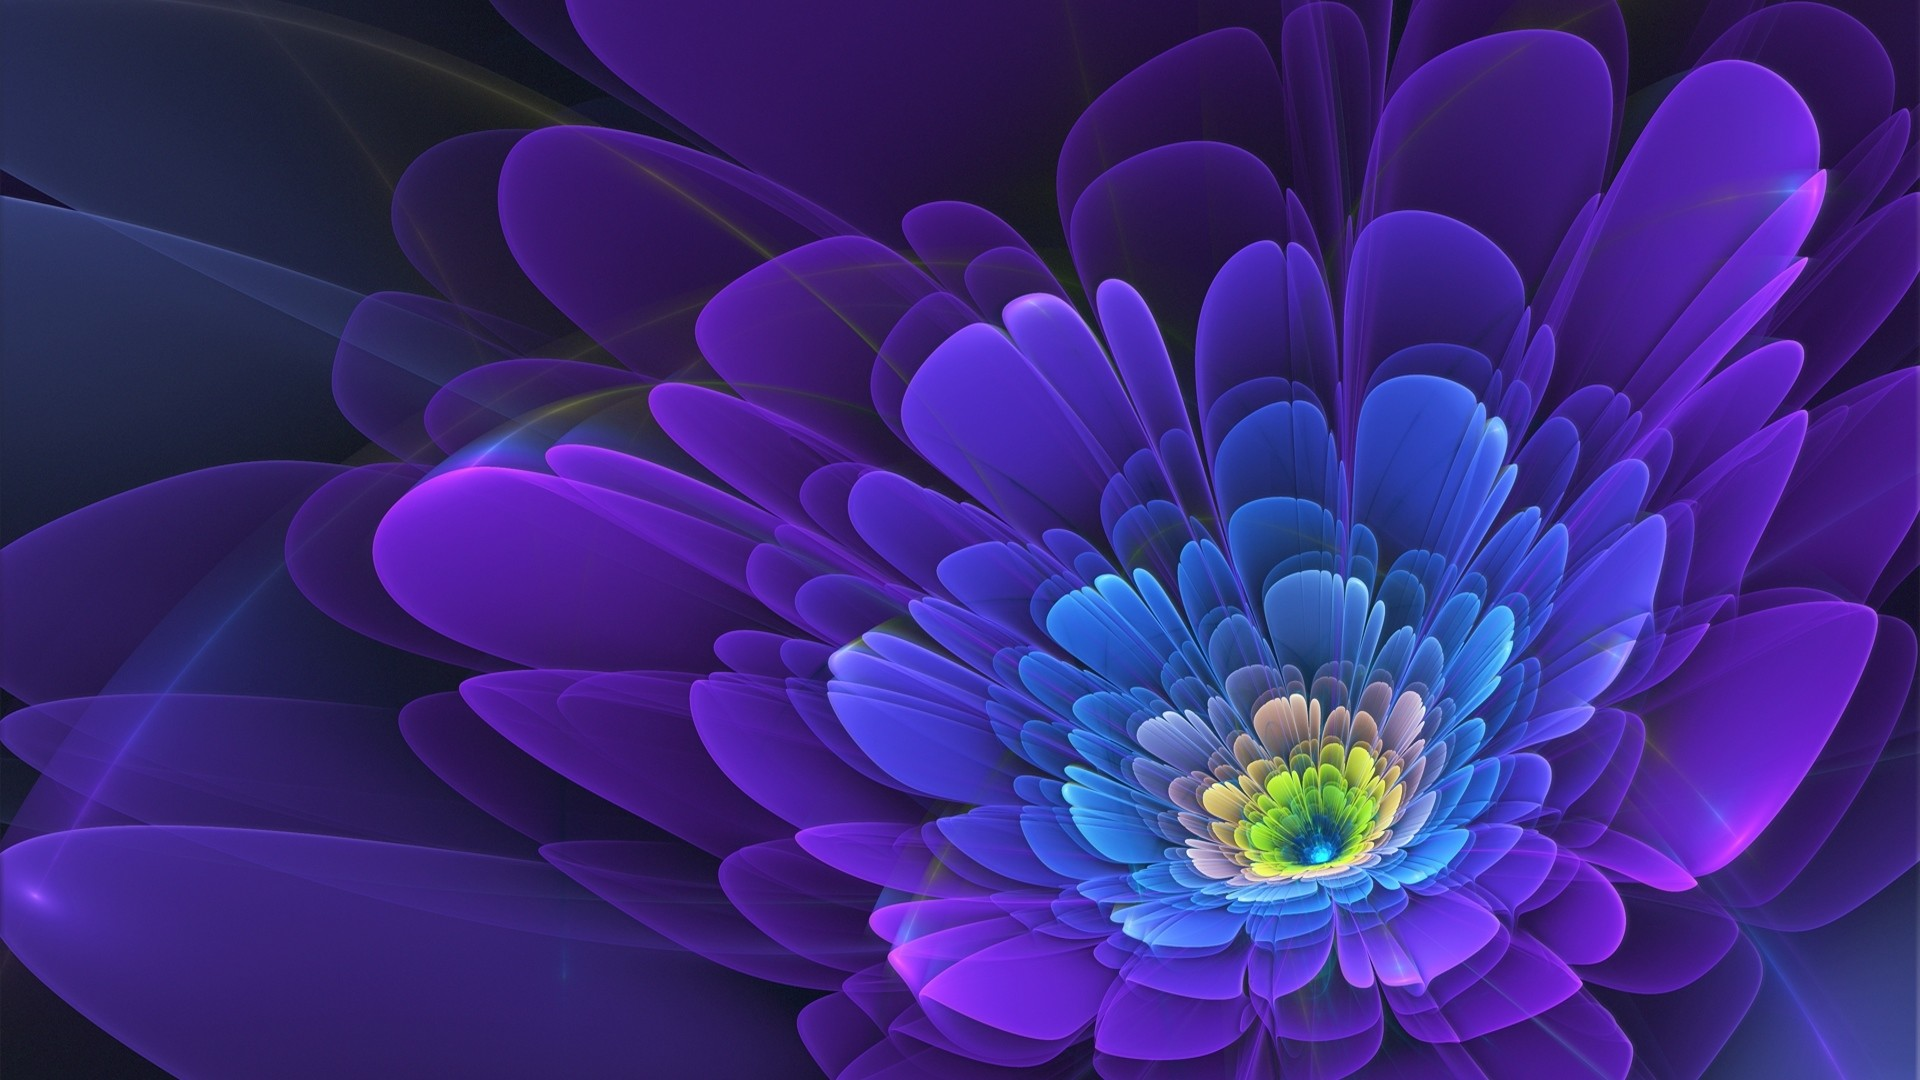 … Background Full HD 1080p. Wallpaper purple, flower, fractal